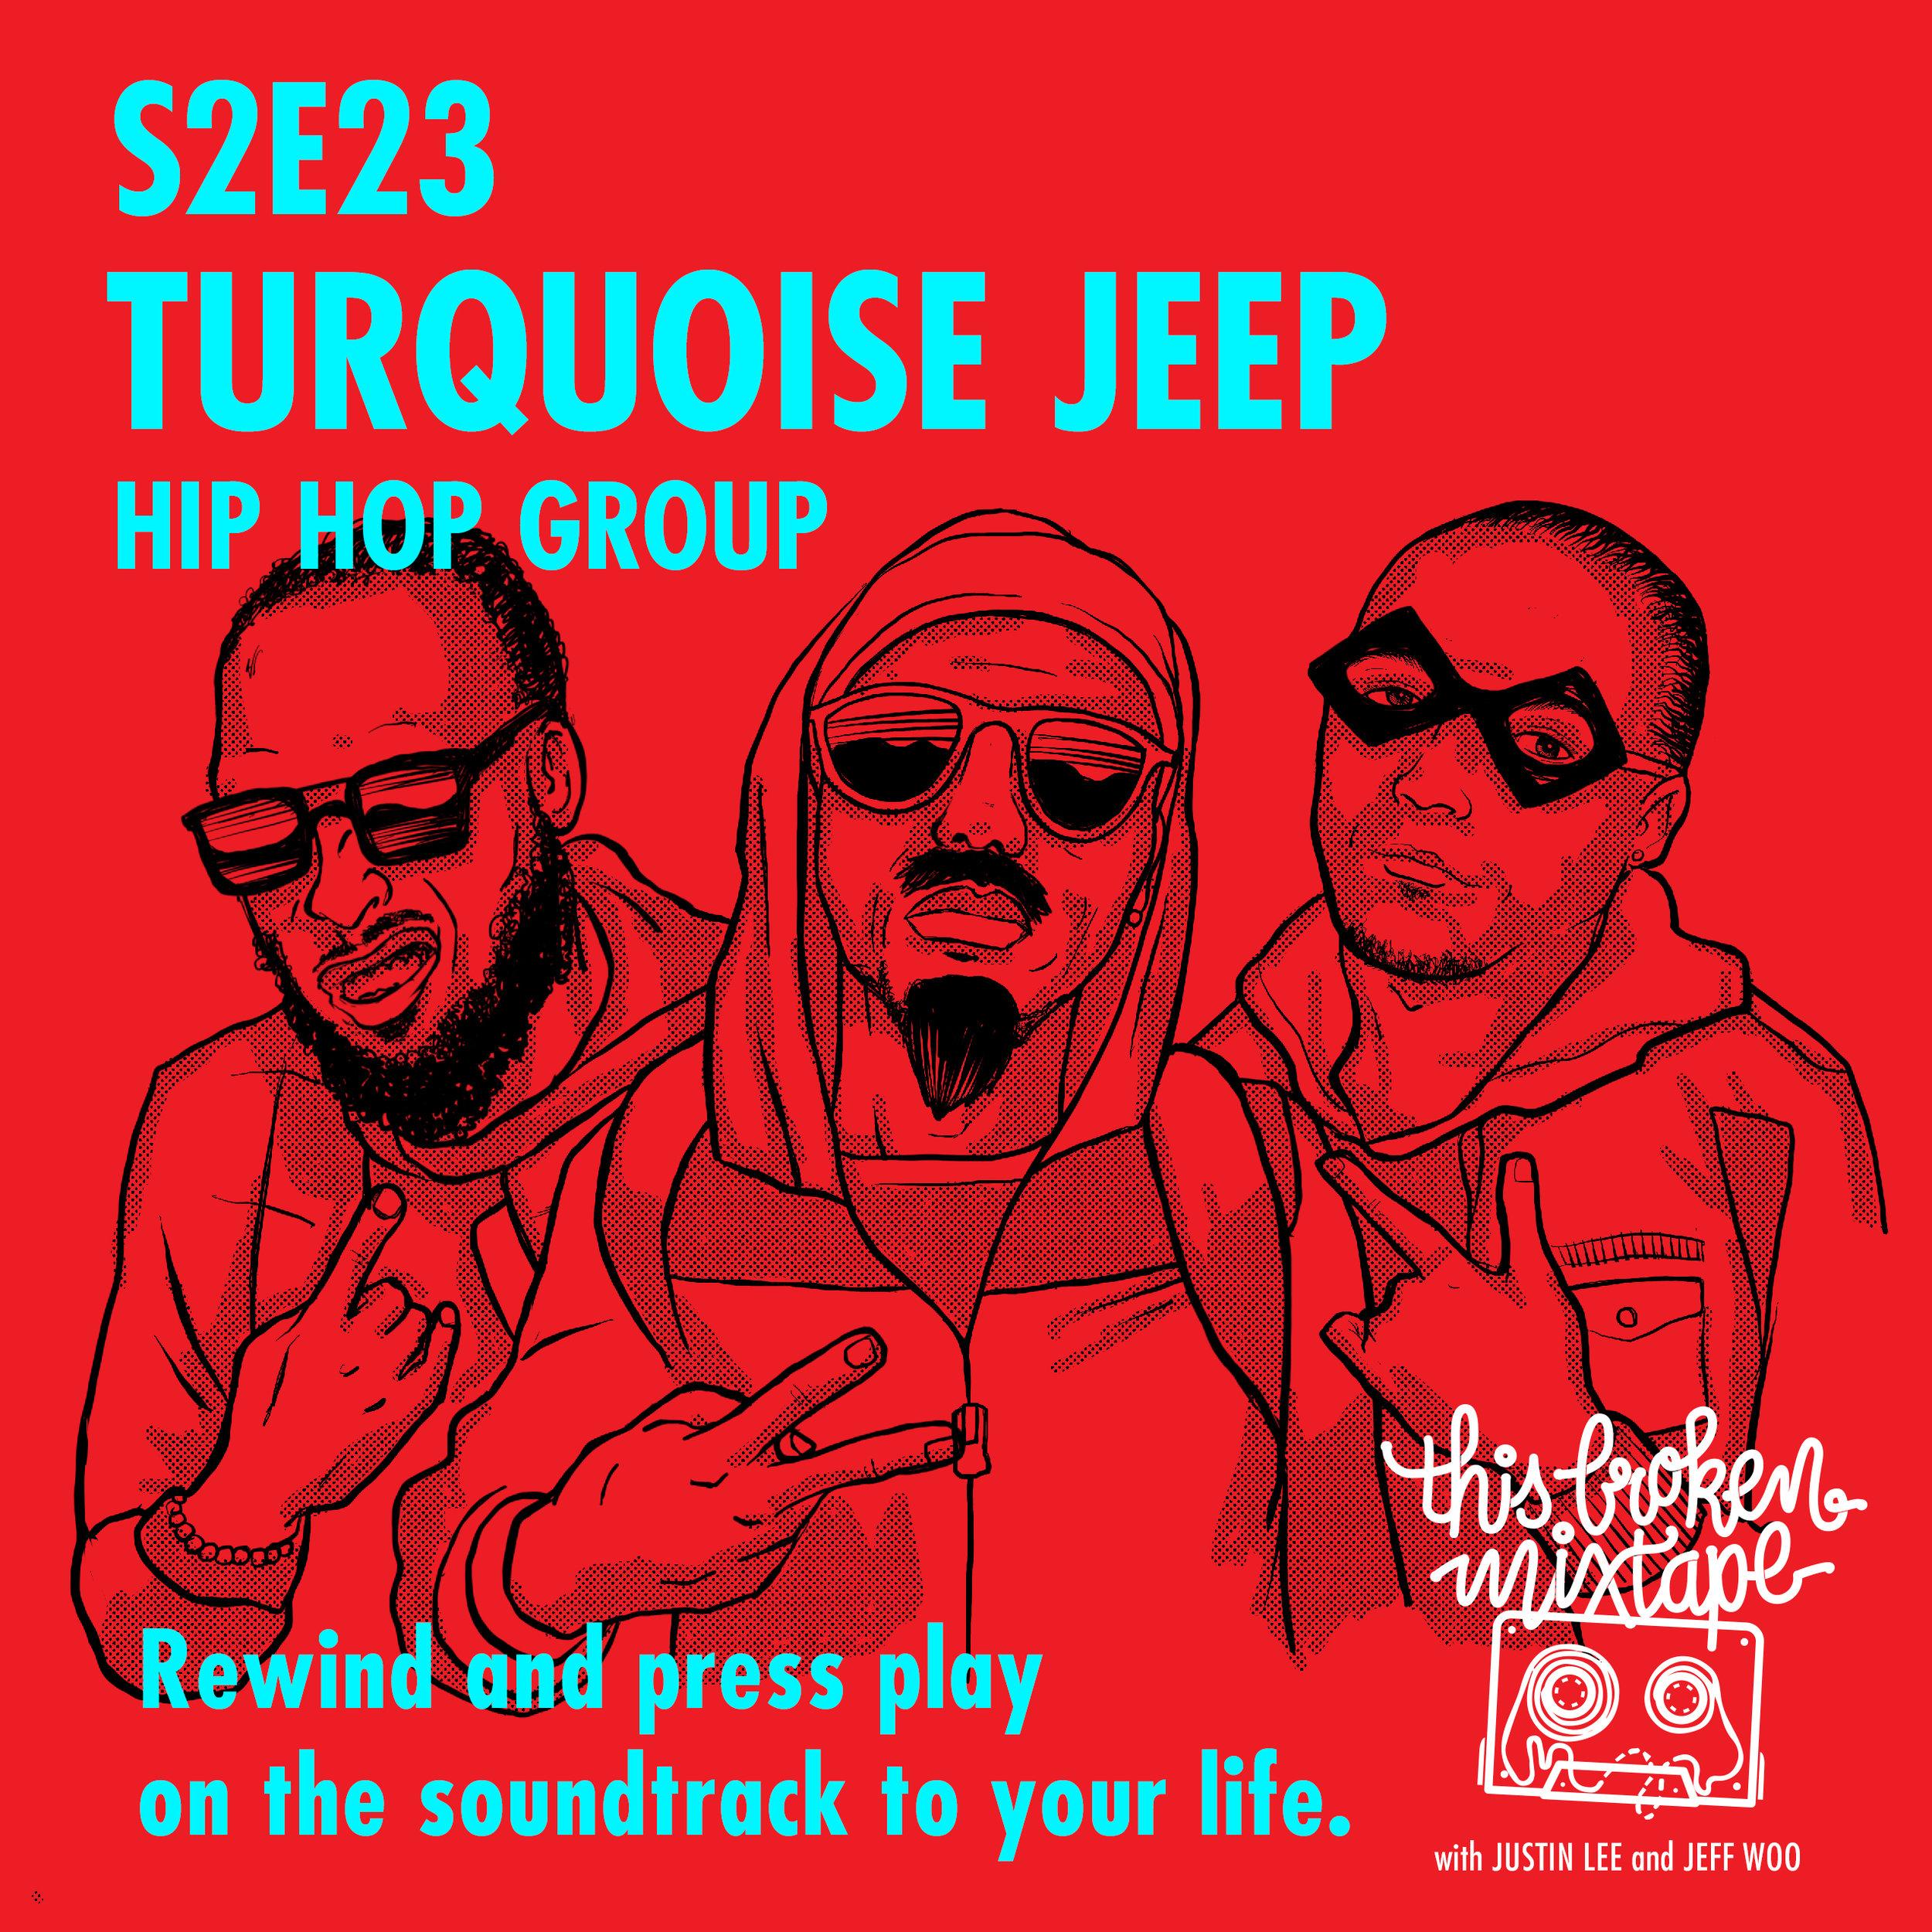 S2E23 Turquoise Jeep.jpg